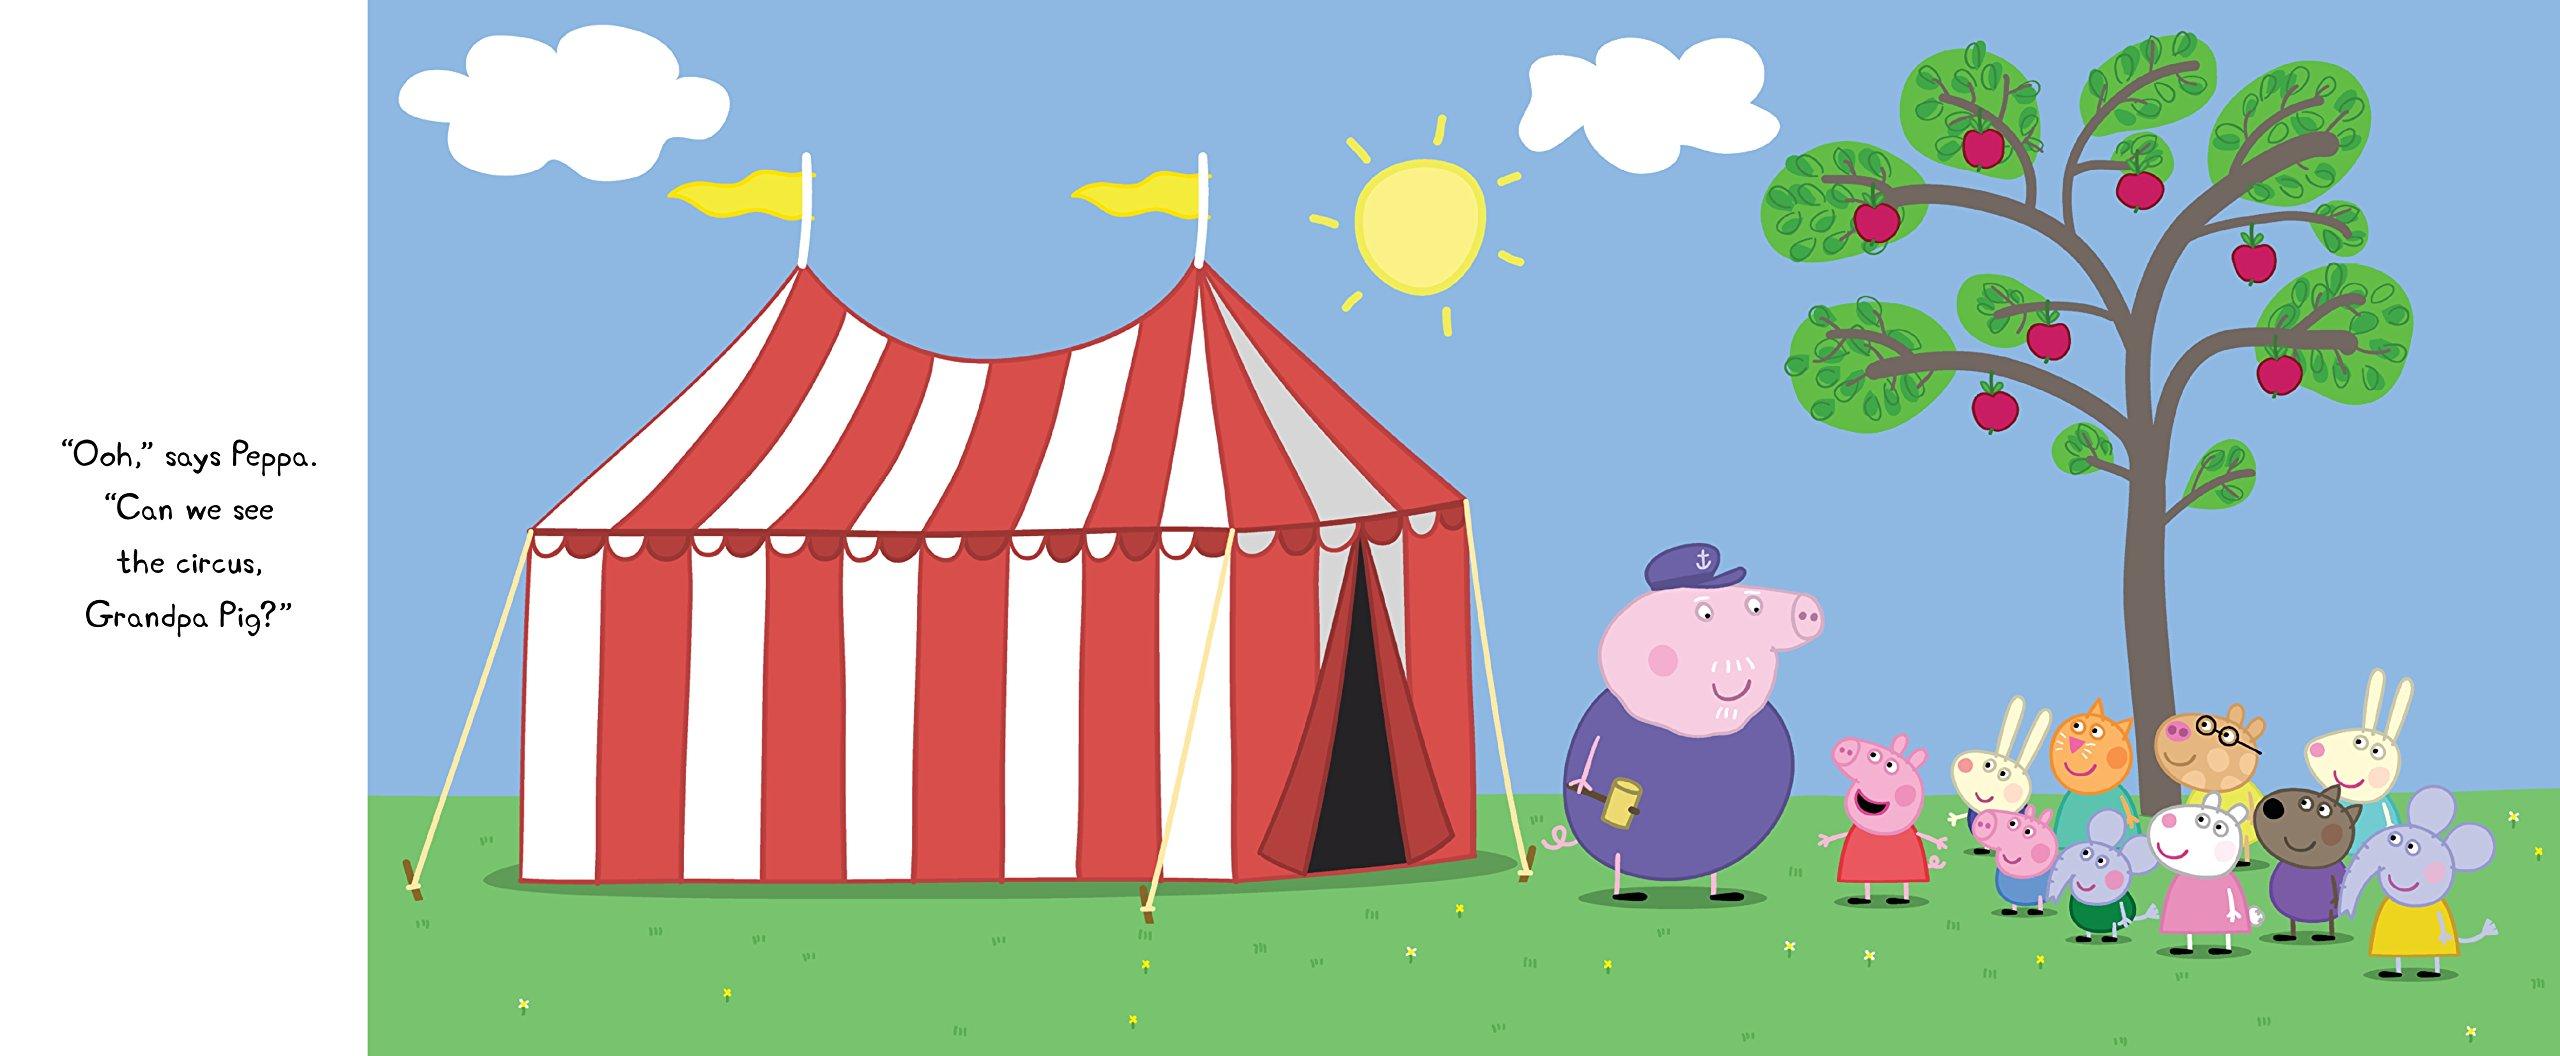 peppa pig and the backyard circus candlewick press 9780763694371